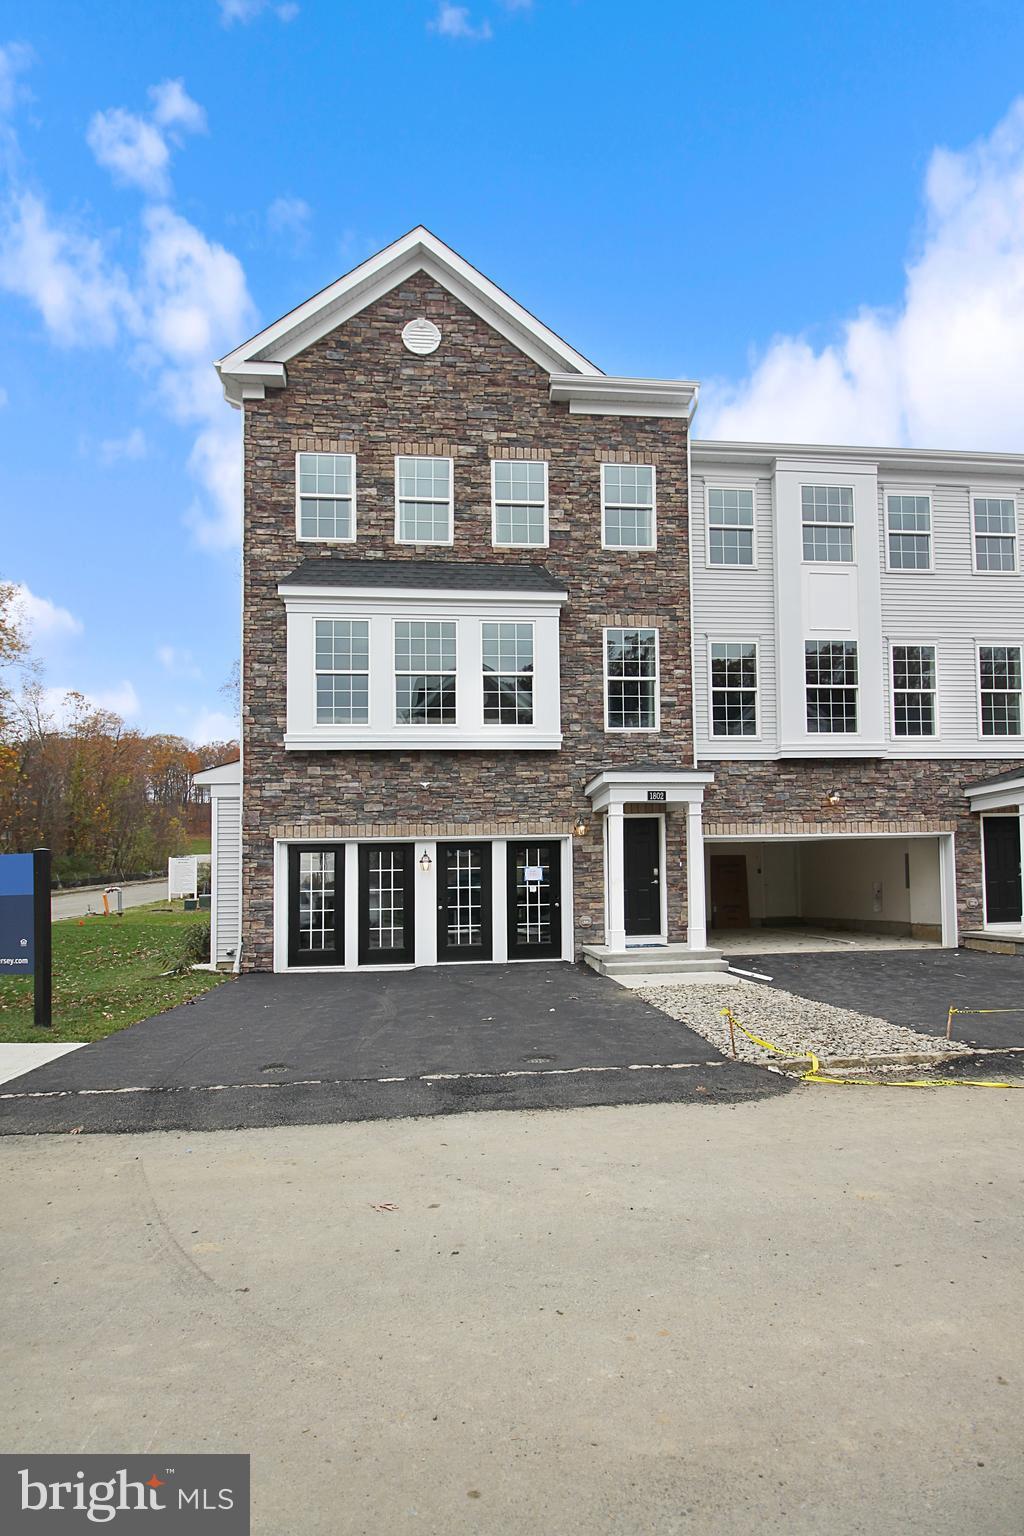 26 Kelly Way, Tinton Falls, NJ 07724